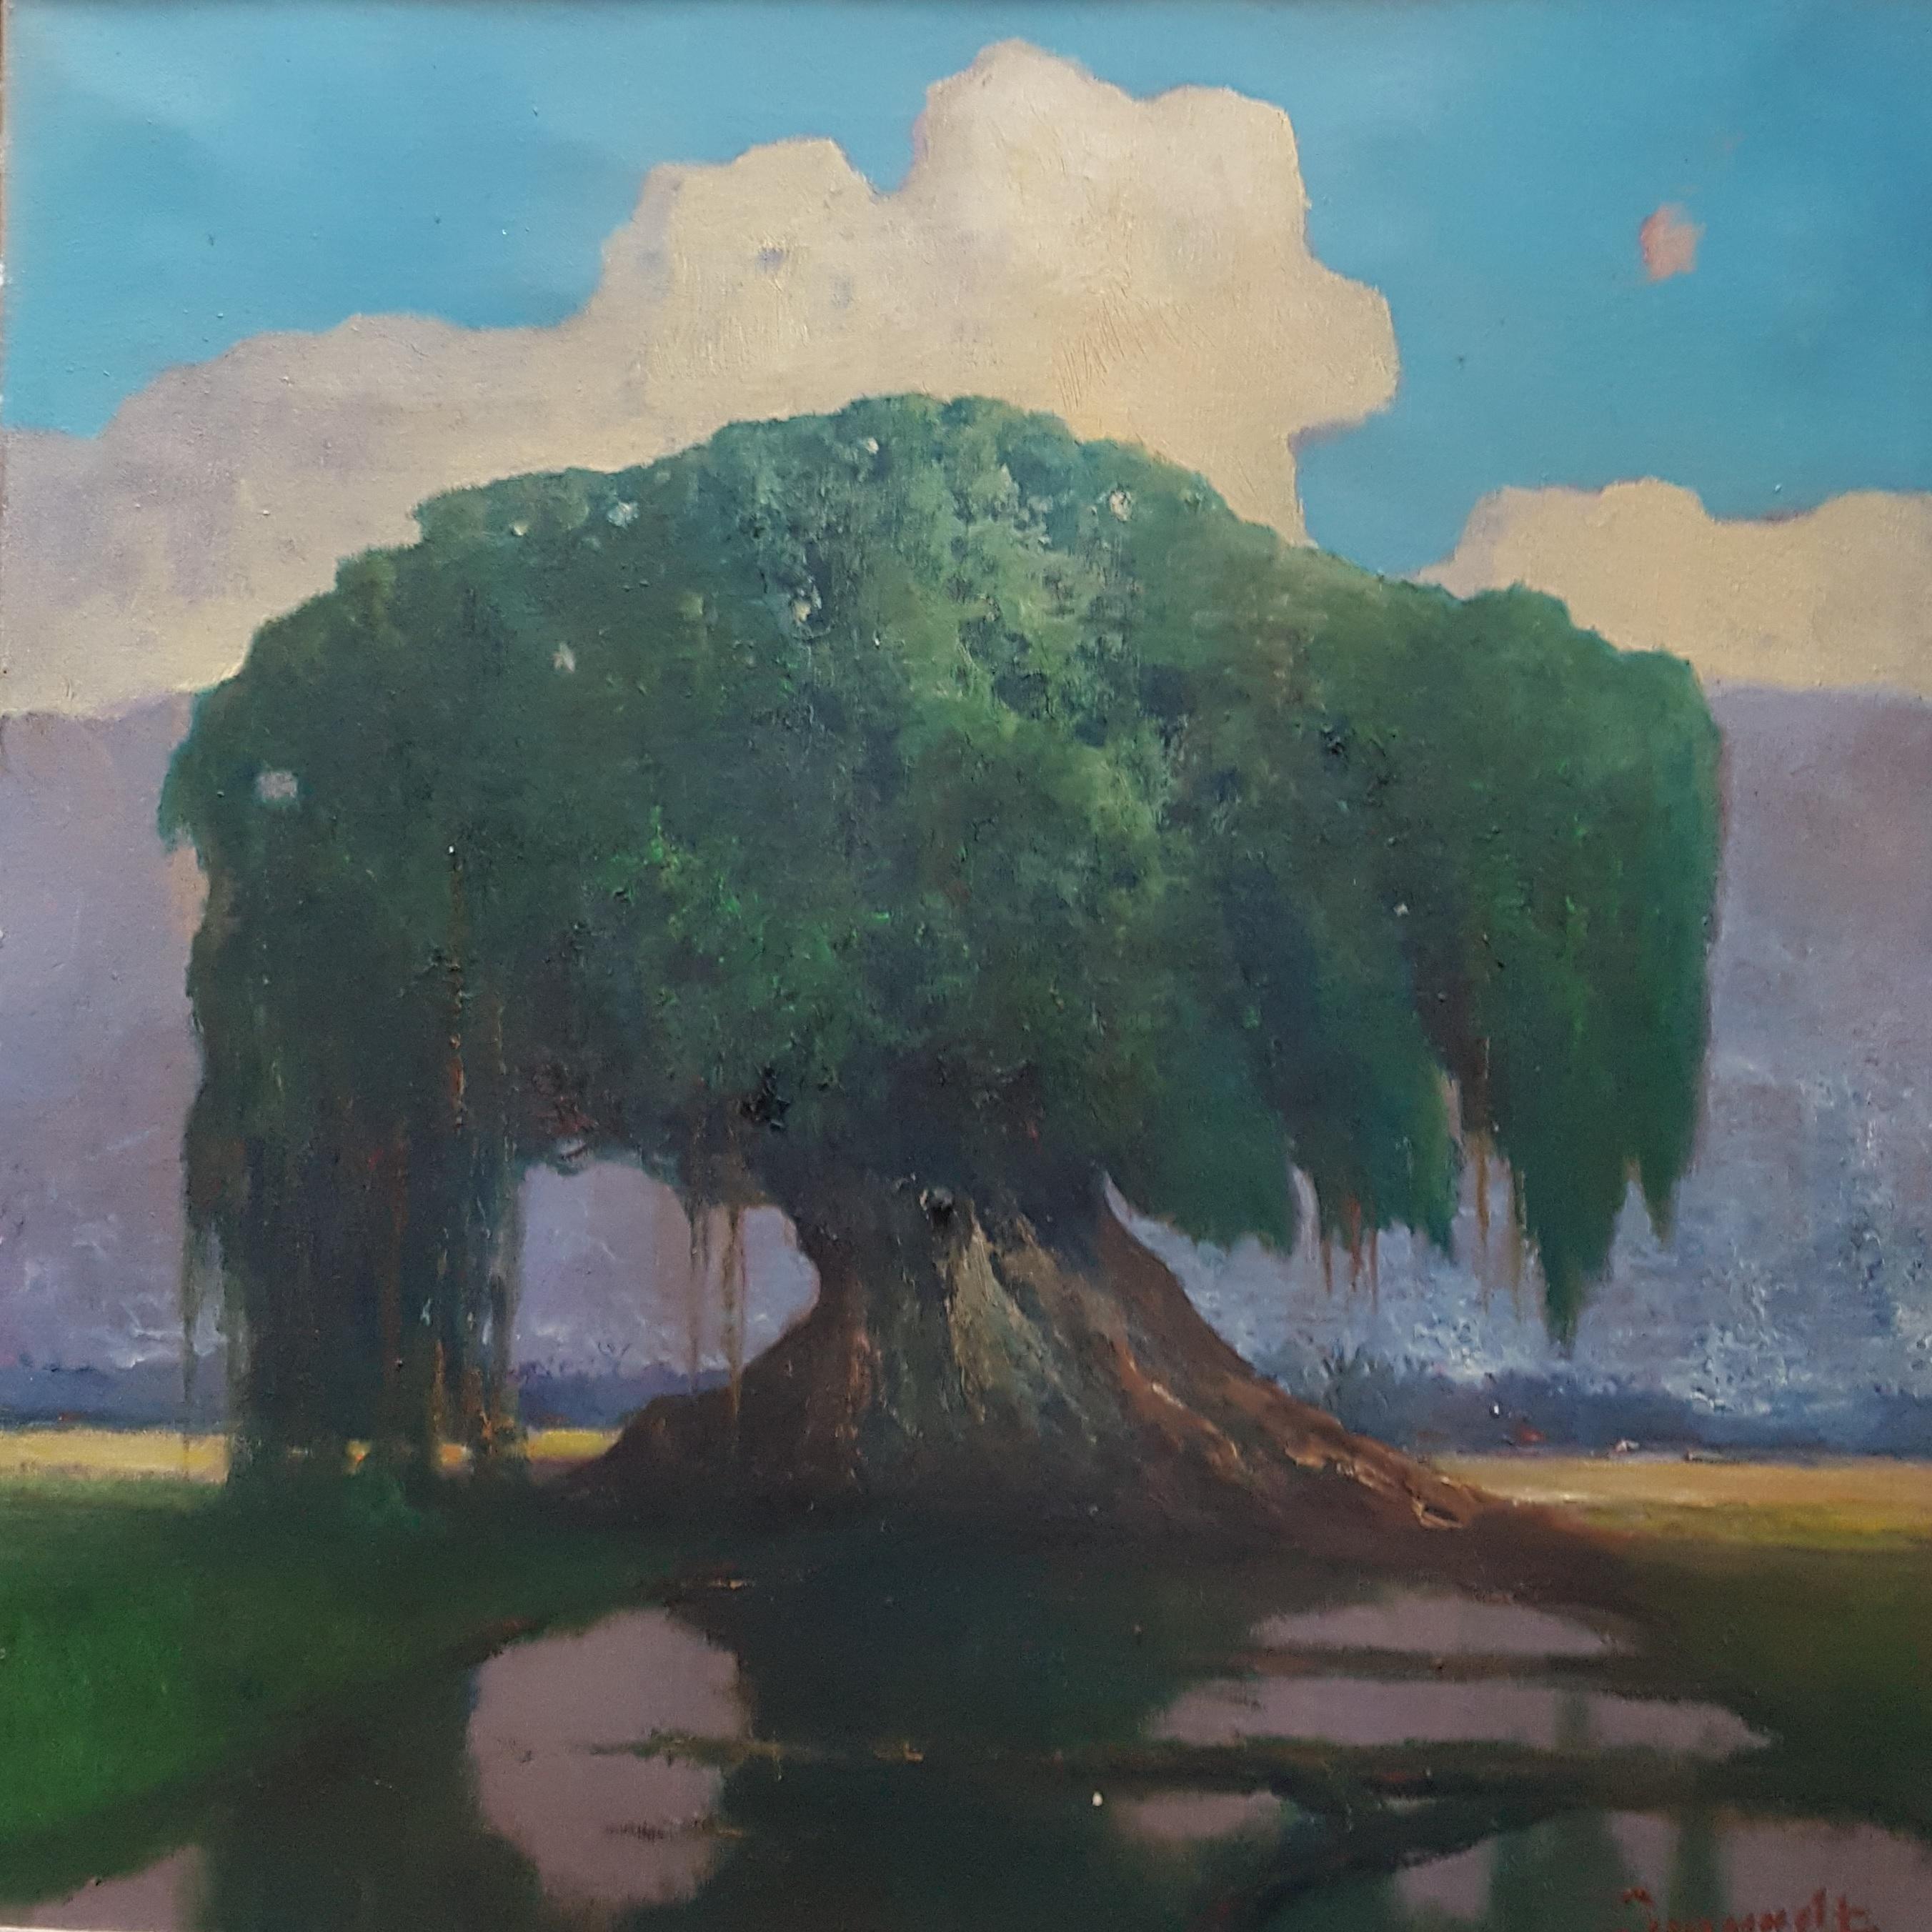 Waringin boom / Banyan tree